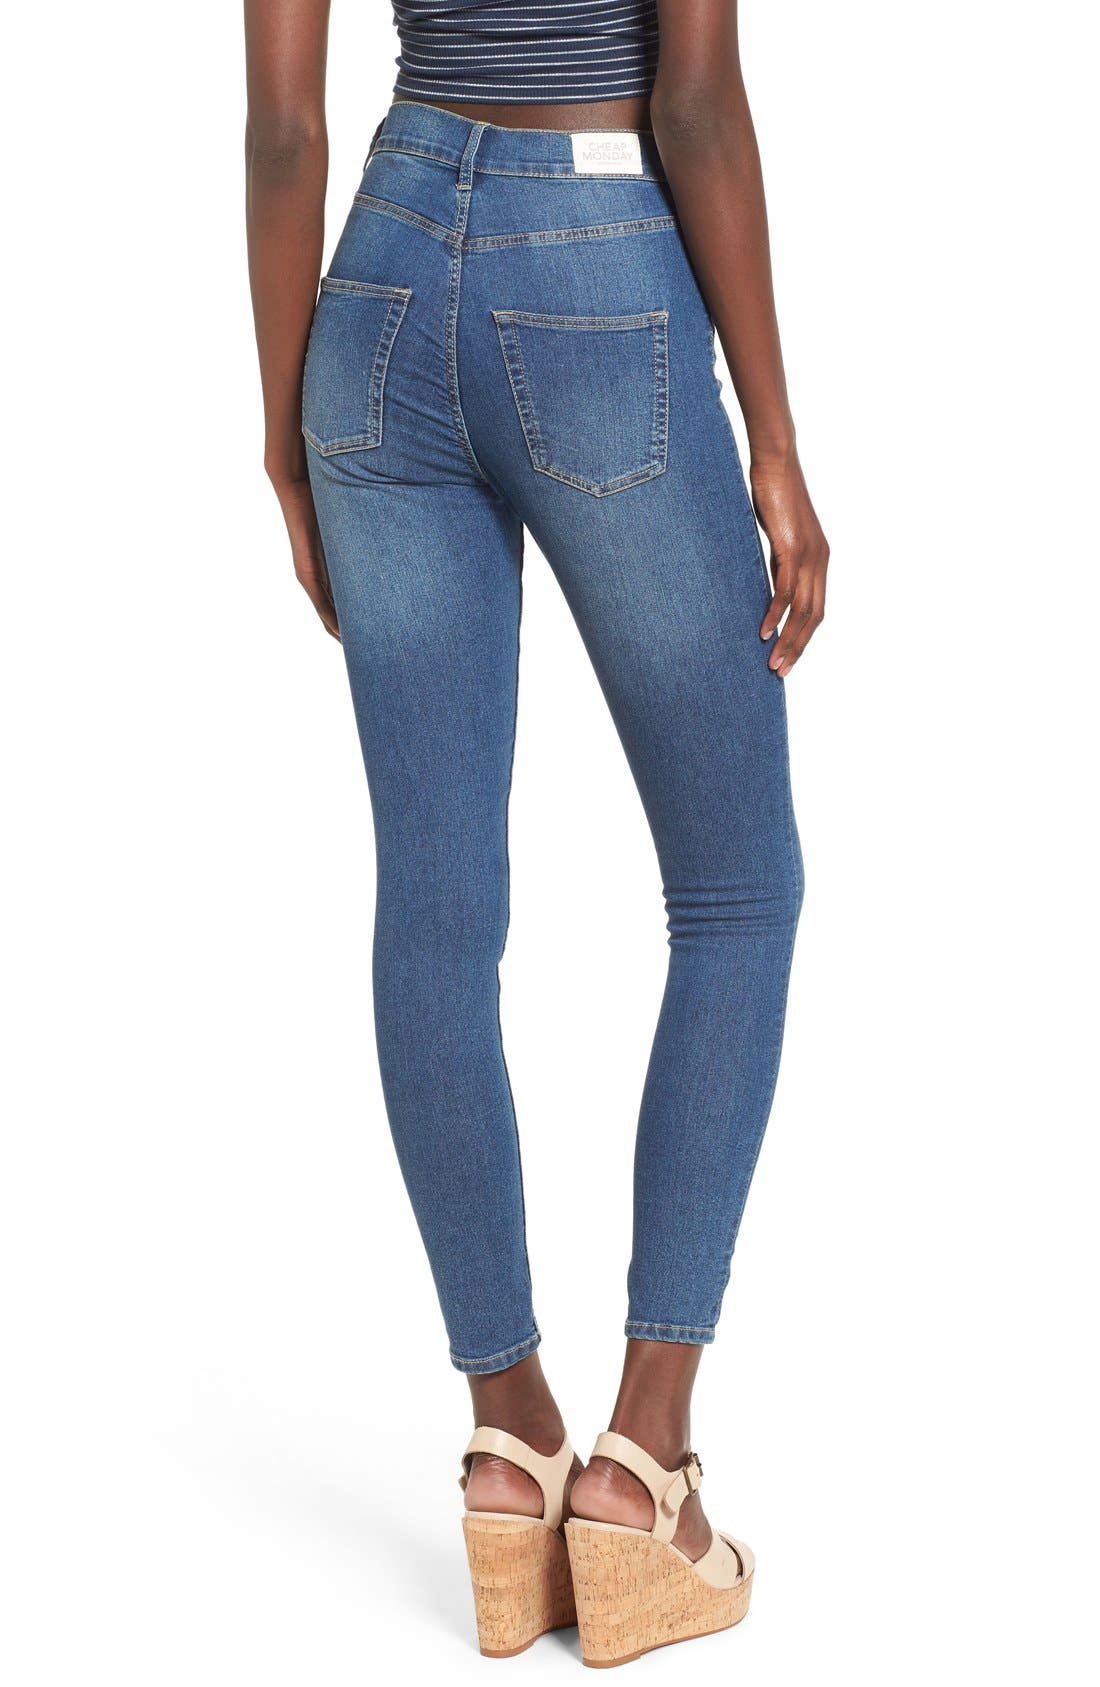 Alternate Image 2  - Cheap Monday 'High Spray' High Rise Skinny Jeans